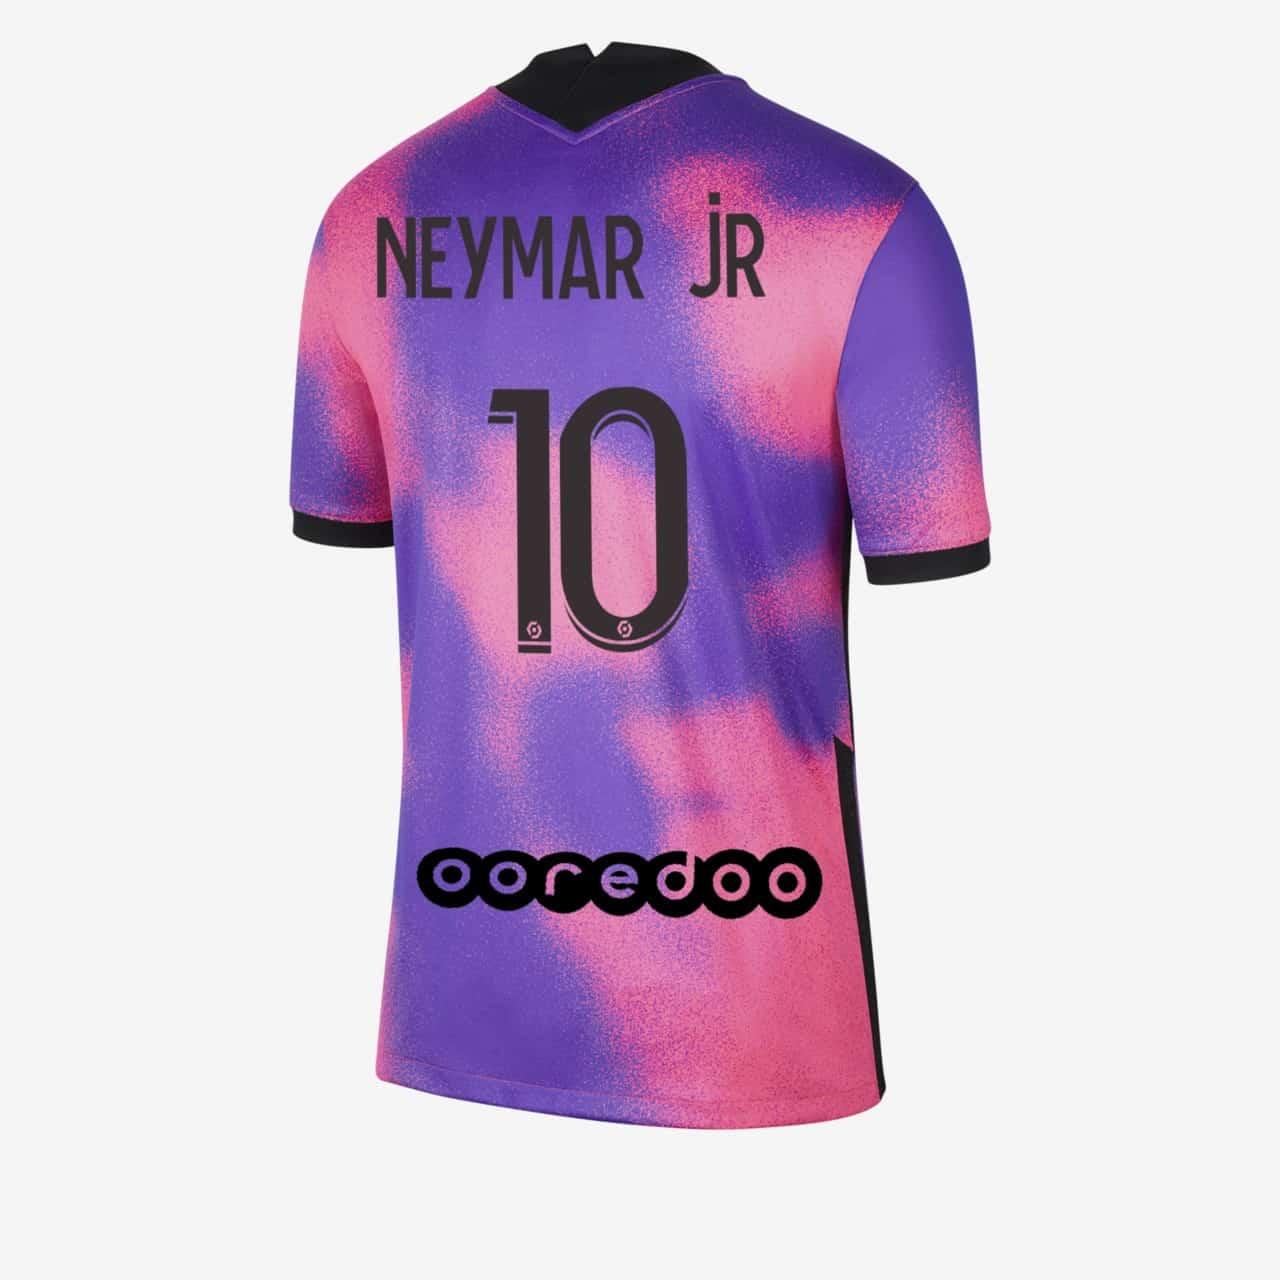 maillot-jordan-psg-neymar-rose-violet-2020-2021